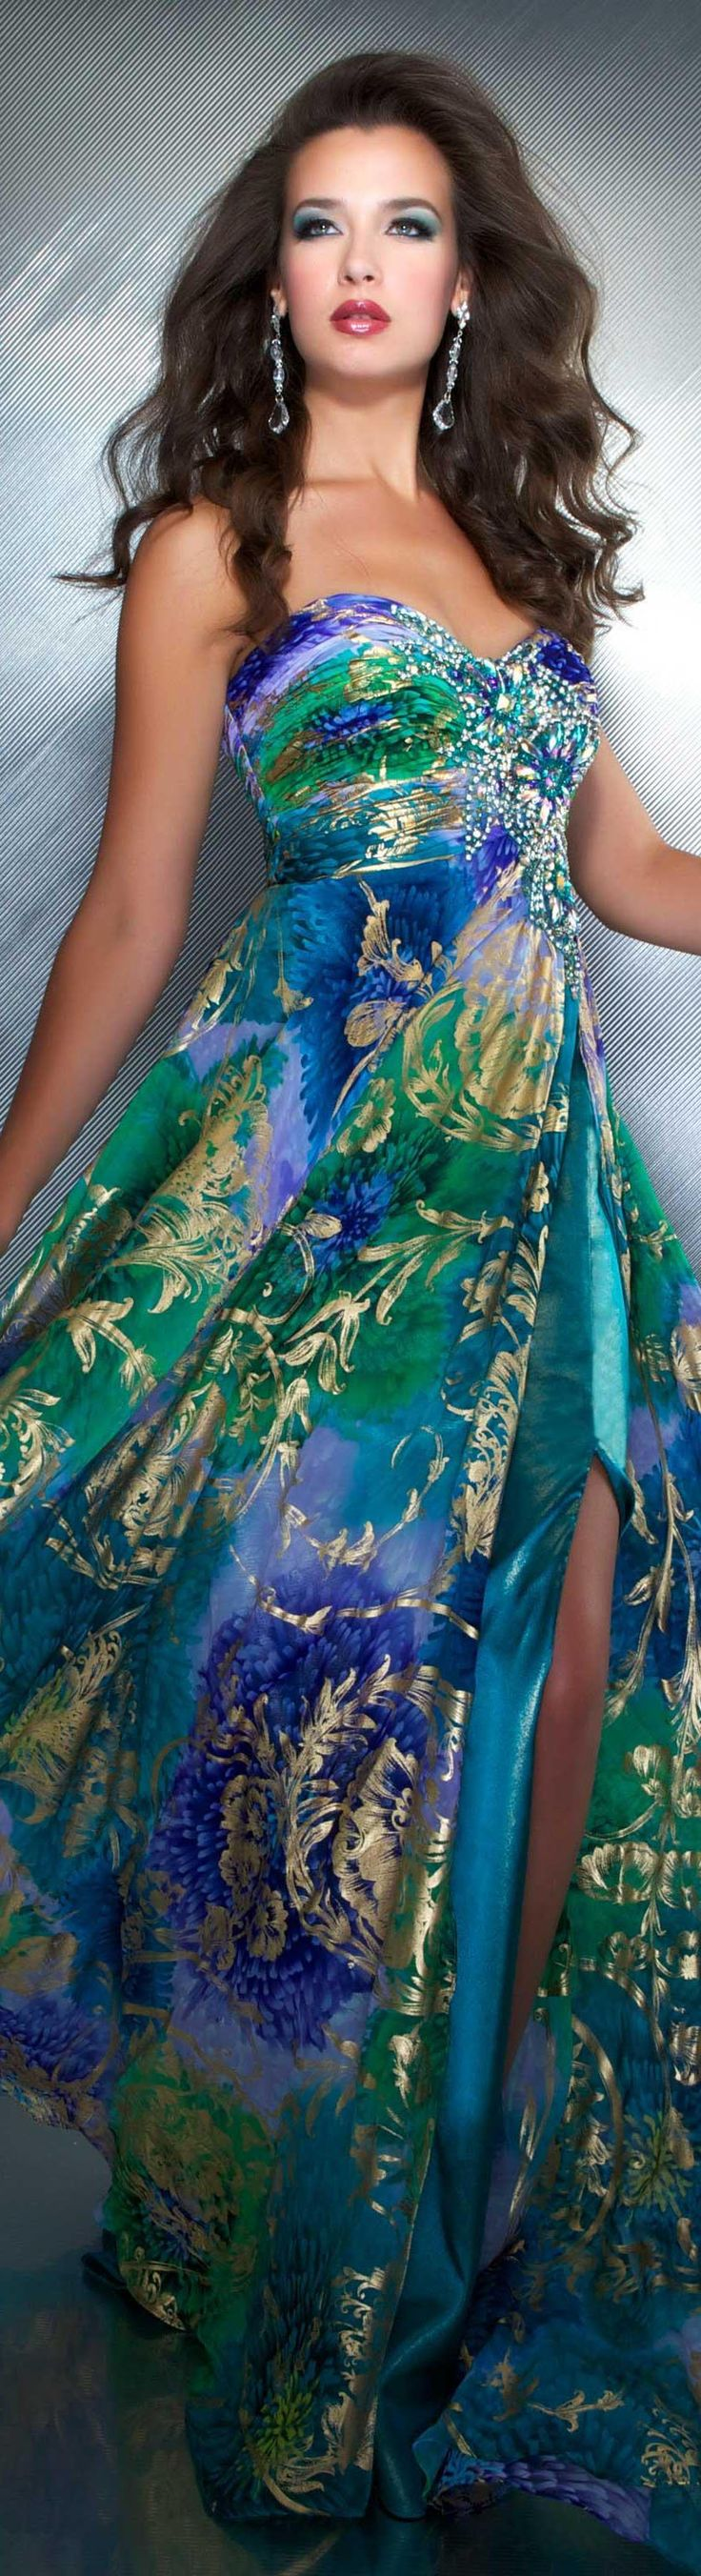 Homecoming Dresses Tropical Resort Wear 91